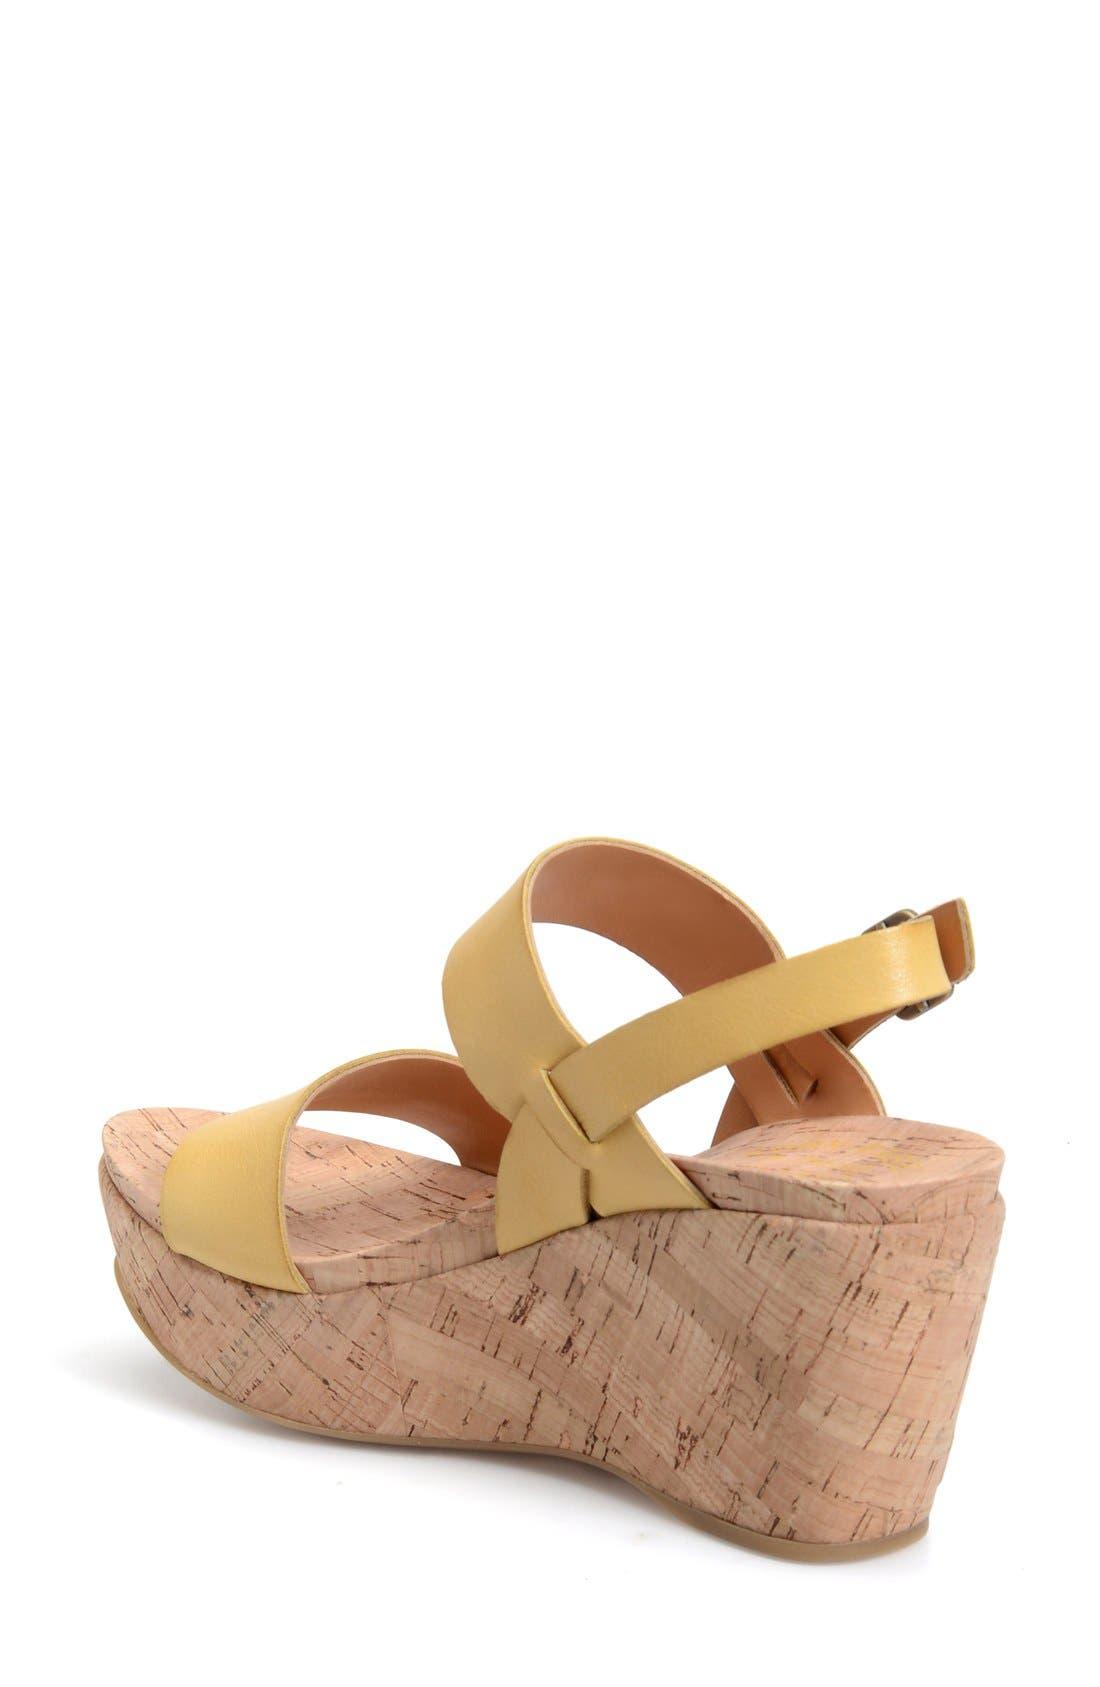 'Austin' Slingback Wedge Sandal,                             Alternate thumbnail 32, color,